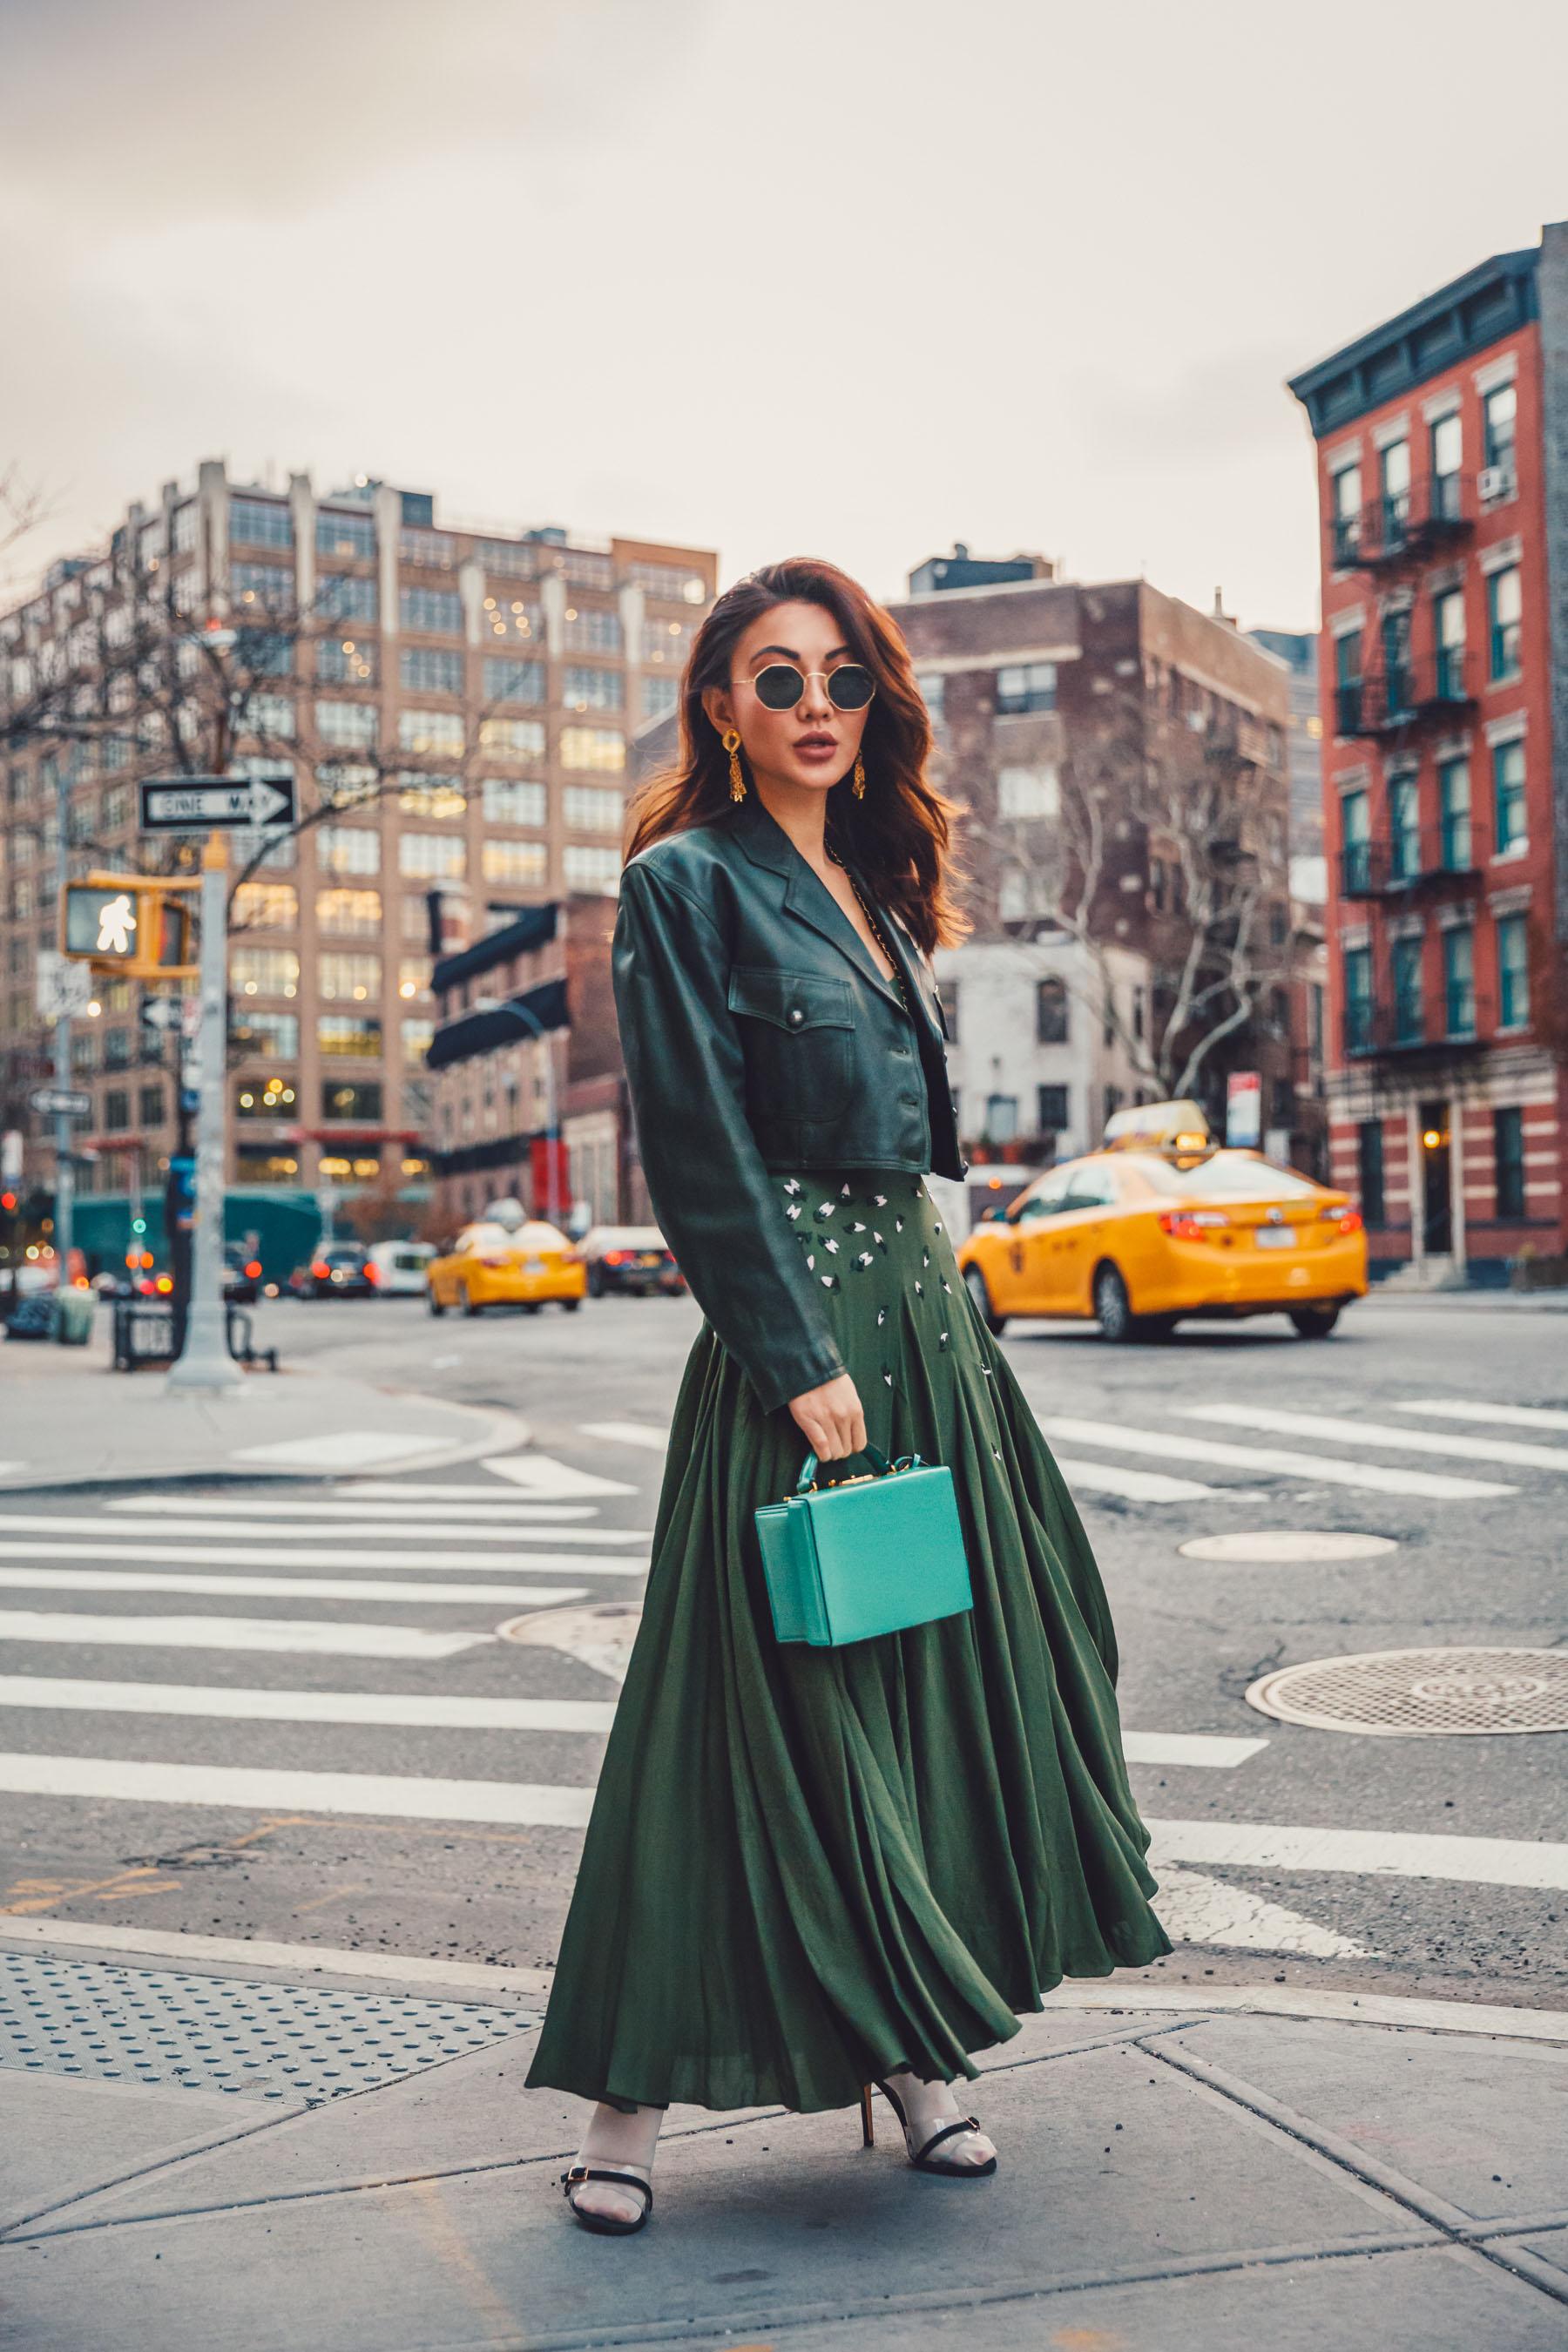 Dress for your unique body type - petite frame, petite style, petite fashion // Notjessfashion.com